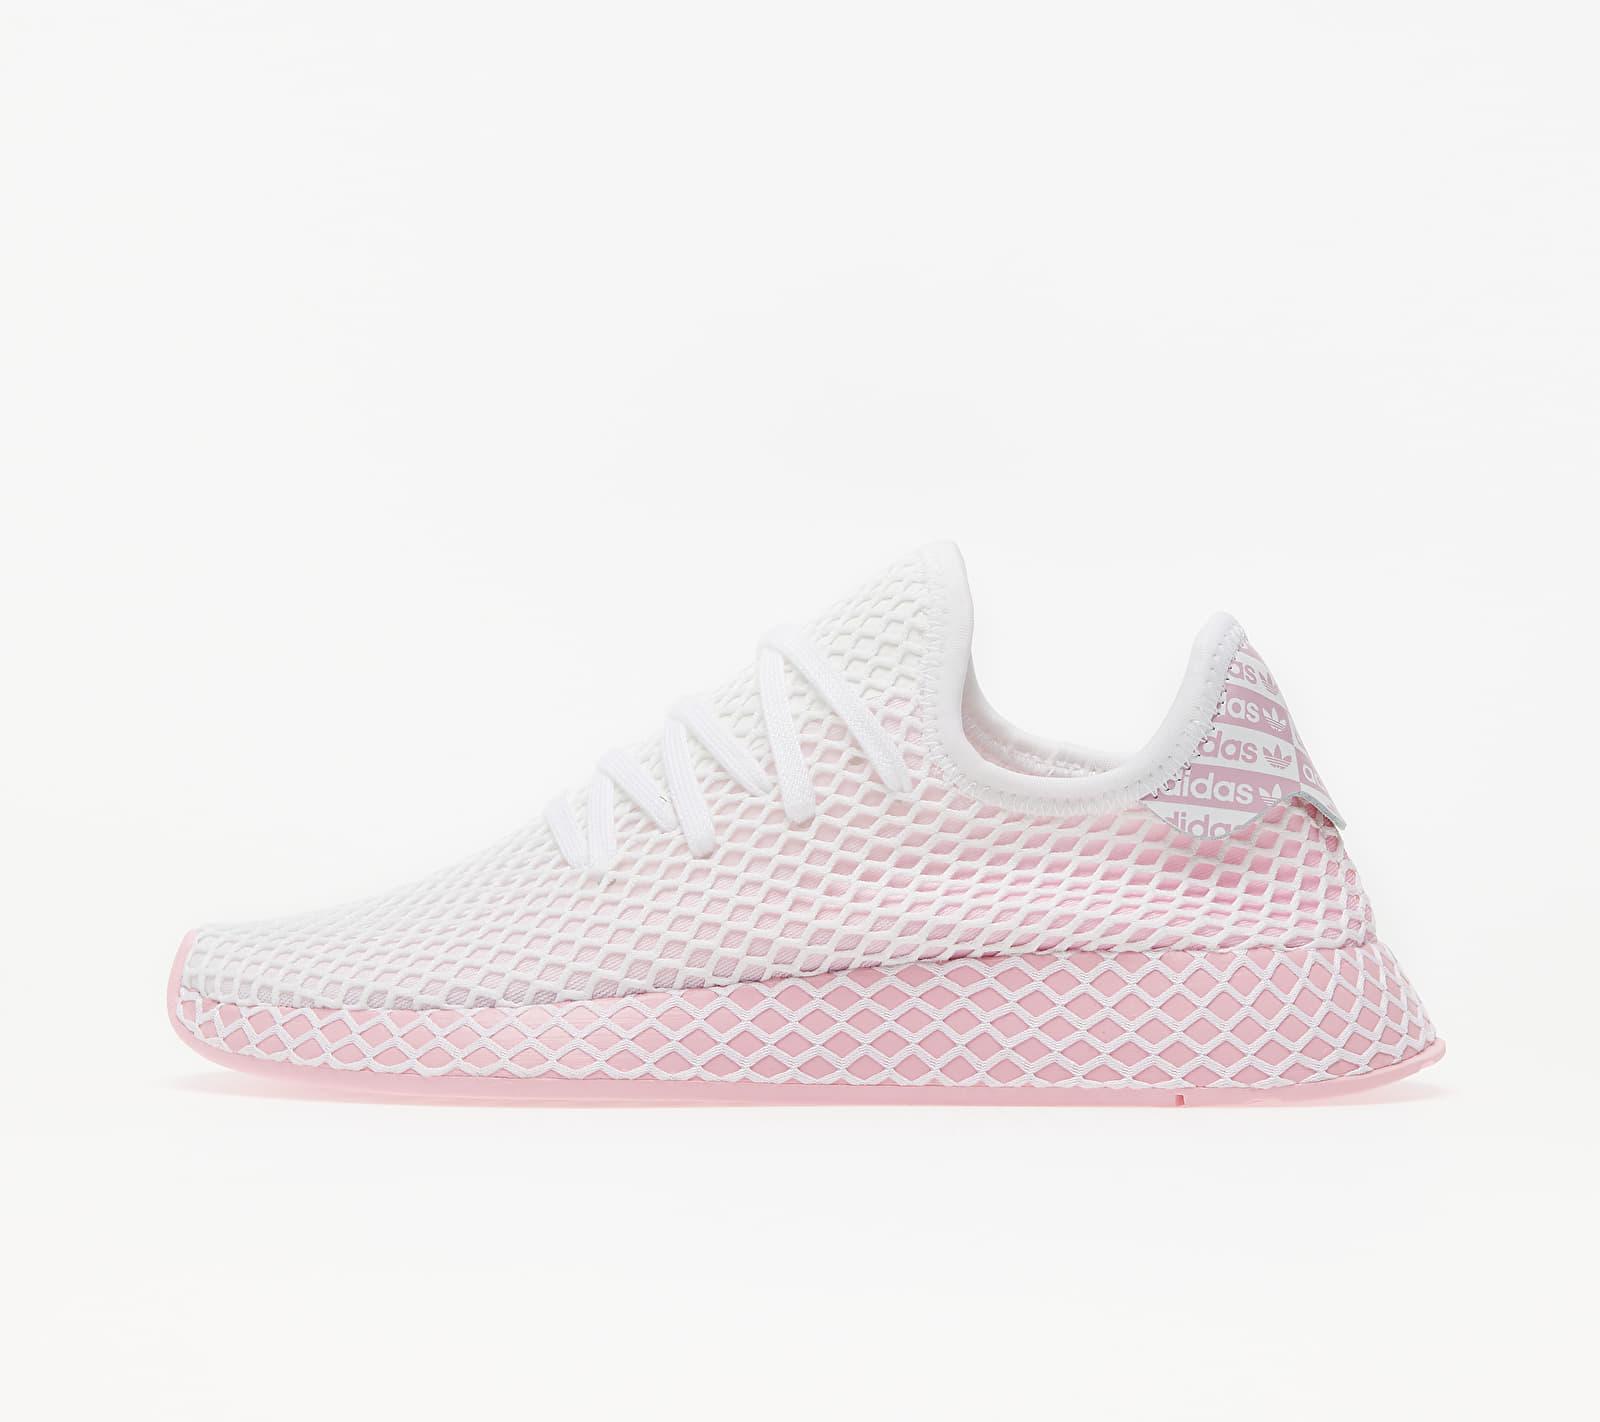 adidas deerupt runner white pink